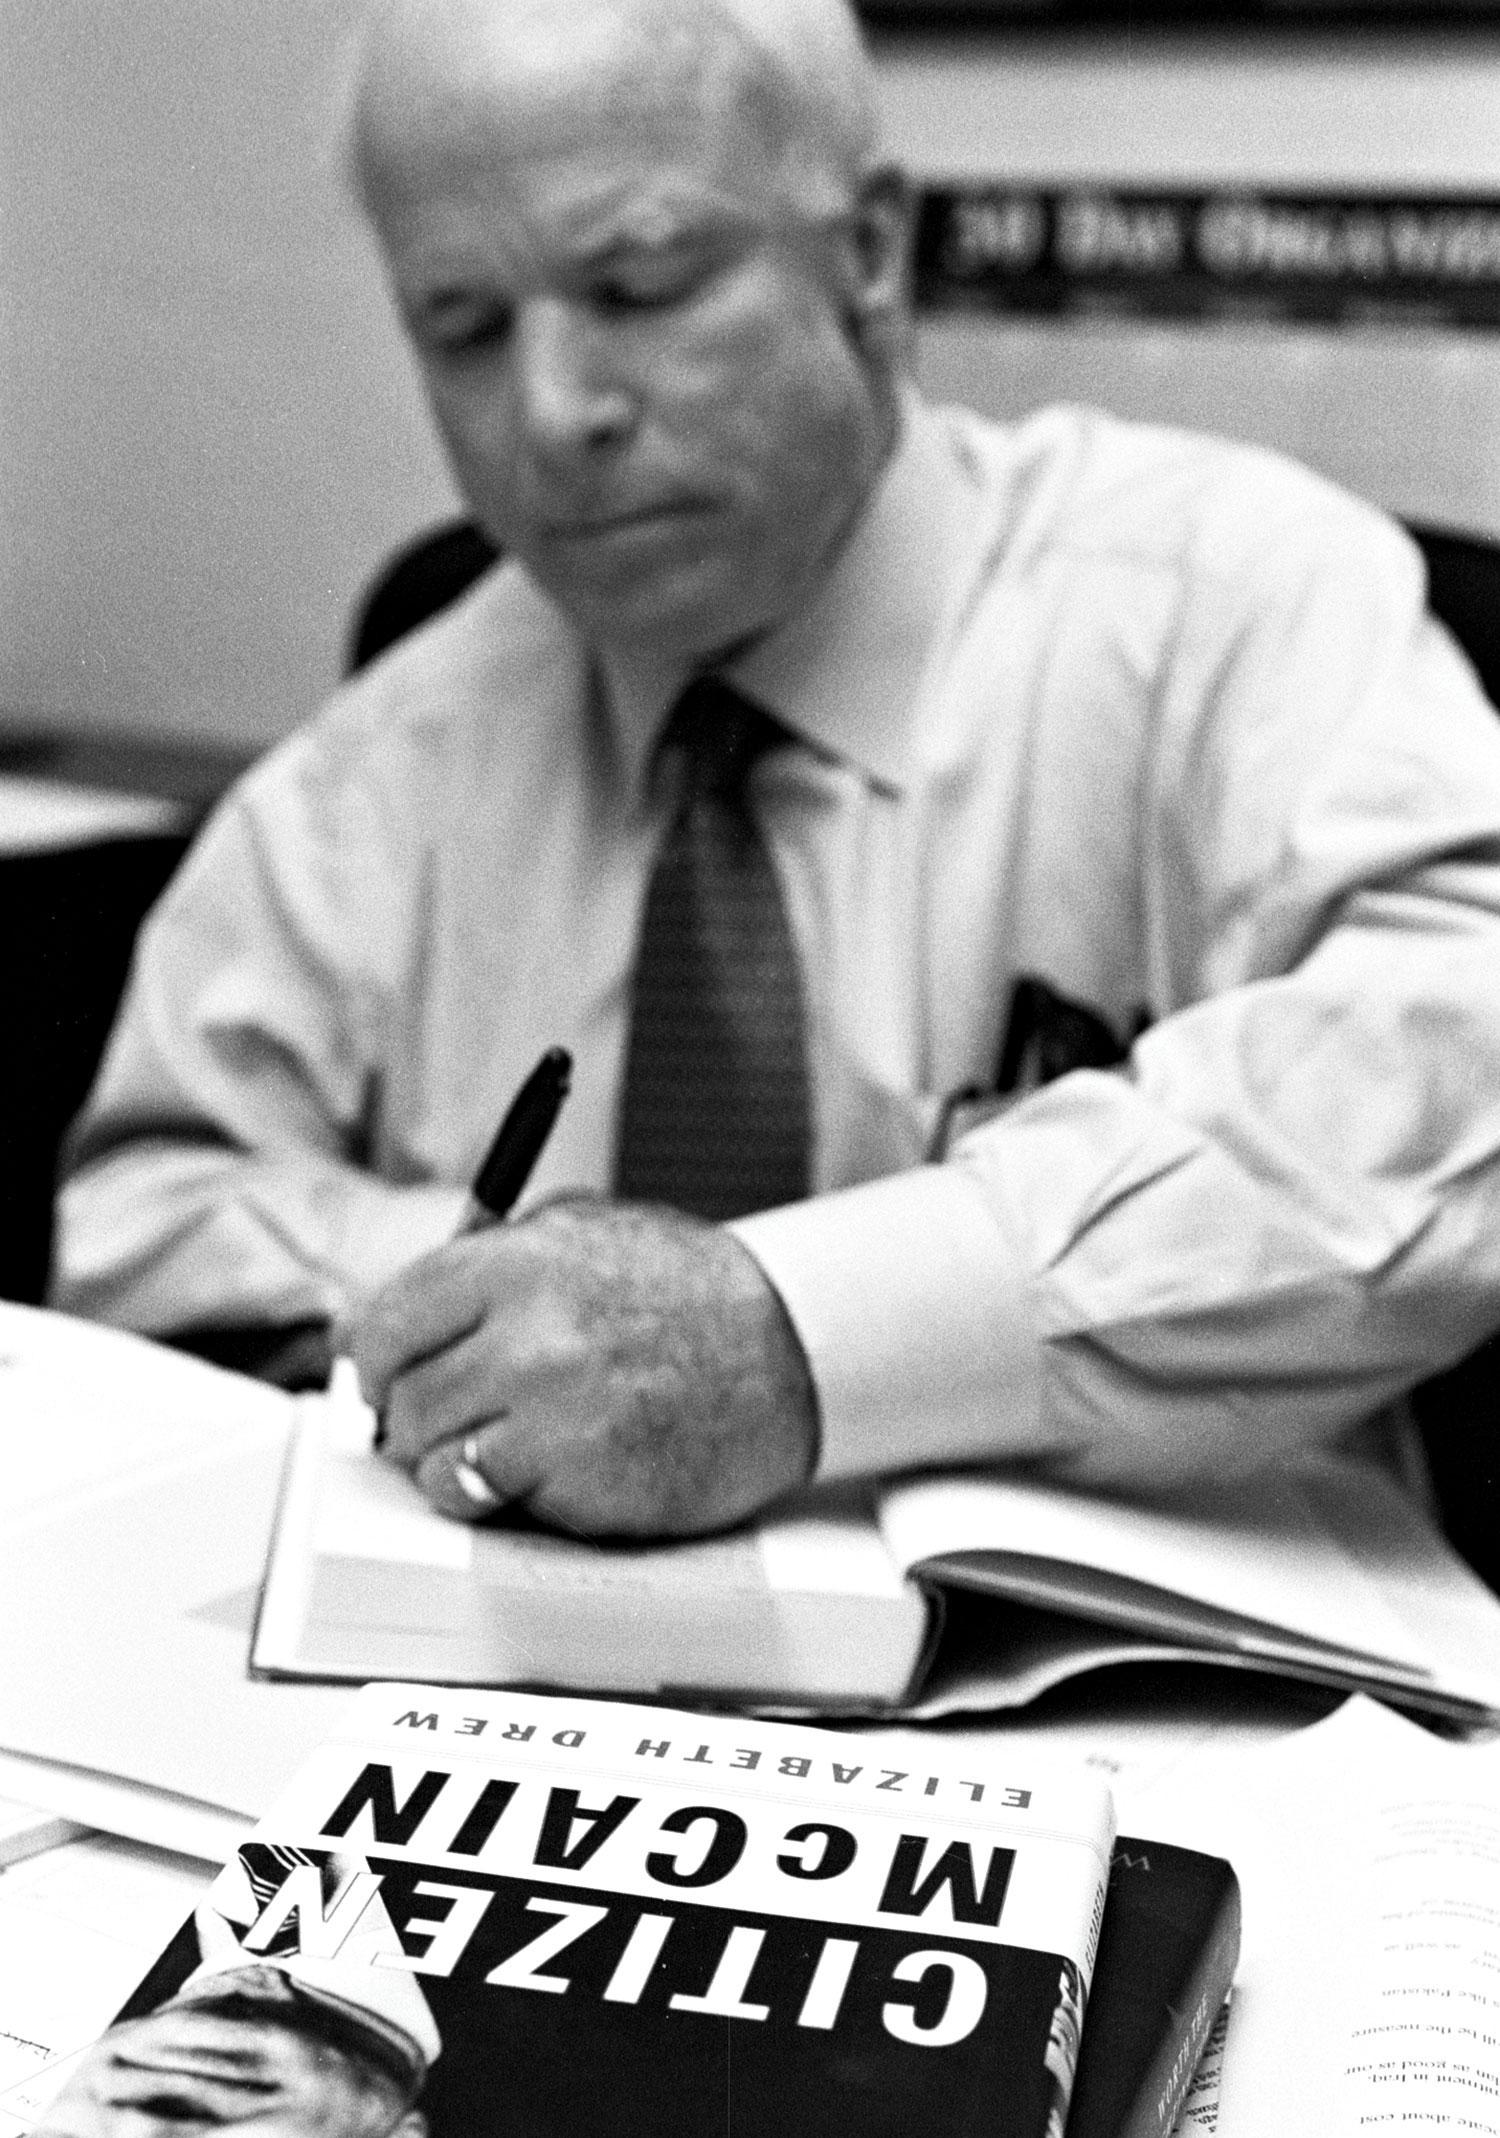 The senator during a 2003 PHOENIX magazine shoot coinciding with the release of his 2002 memoir Citizen McCain